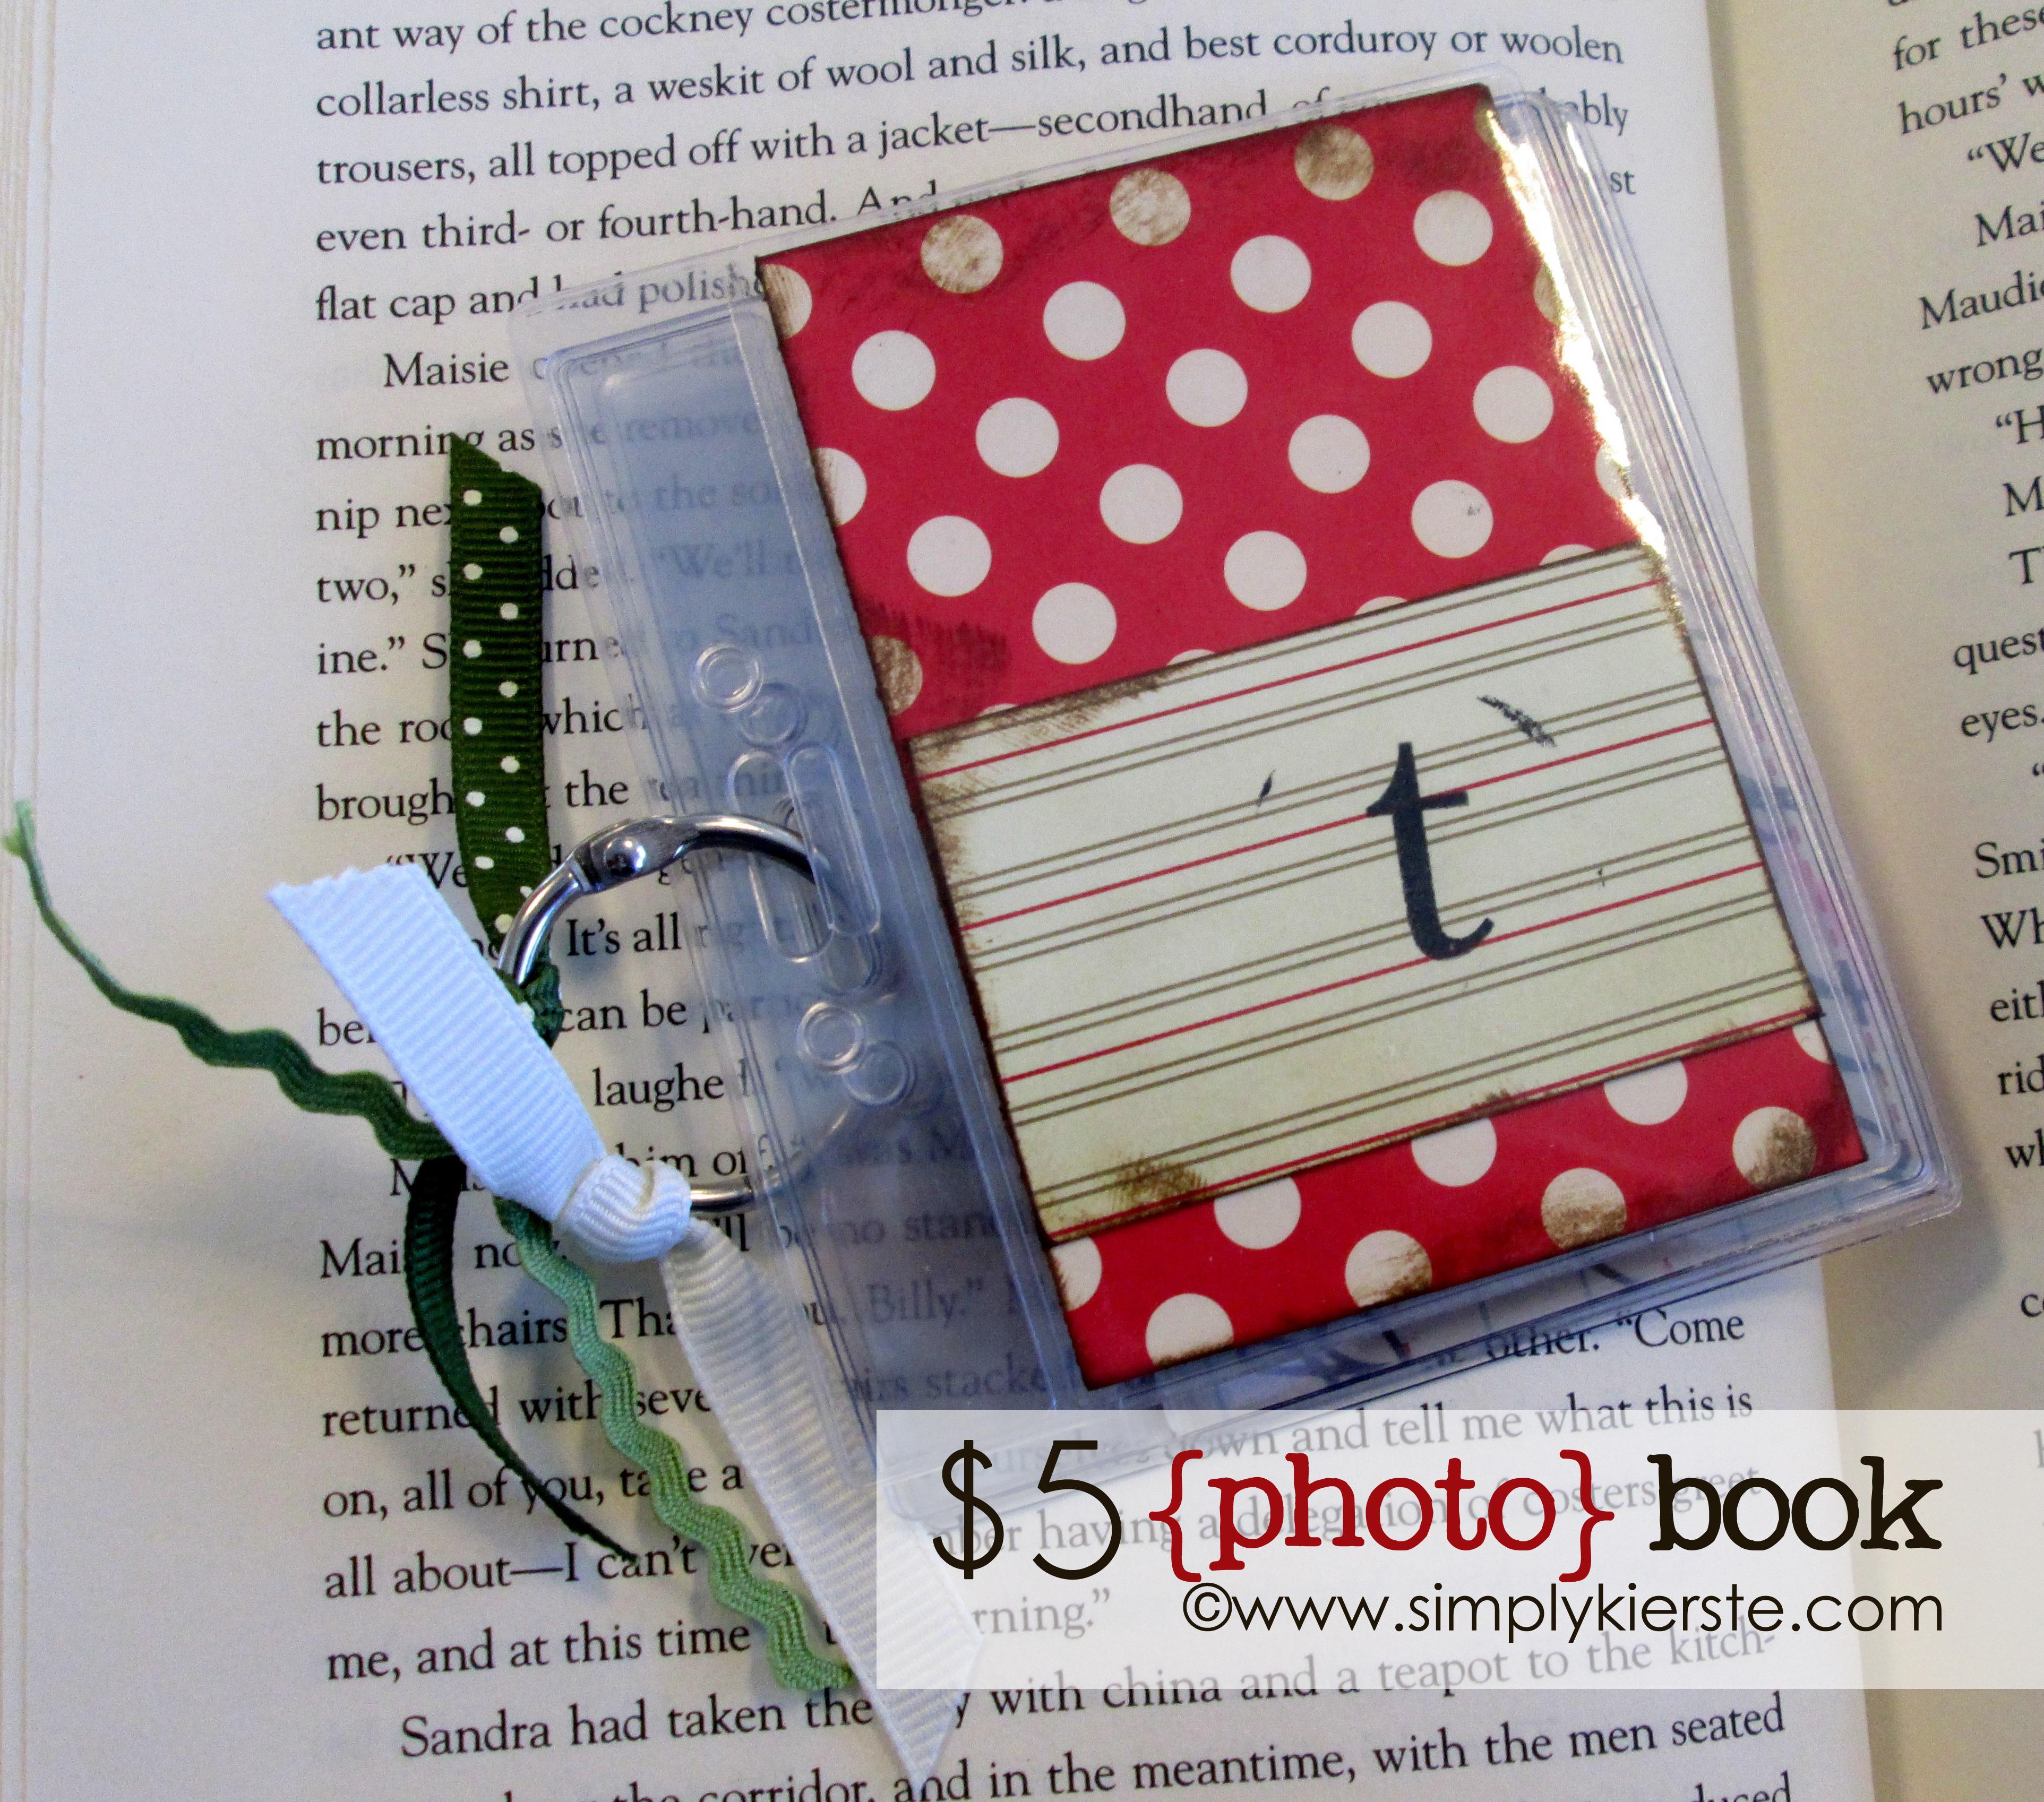 $5 Purse-sized Photo Brag Book